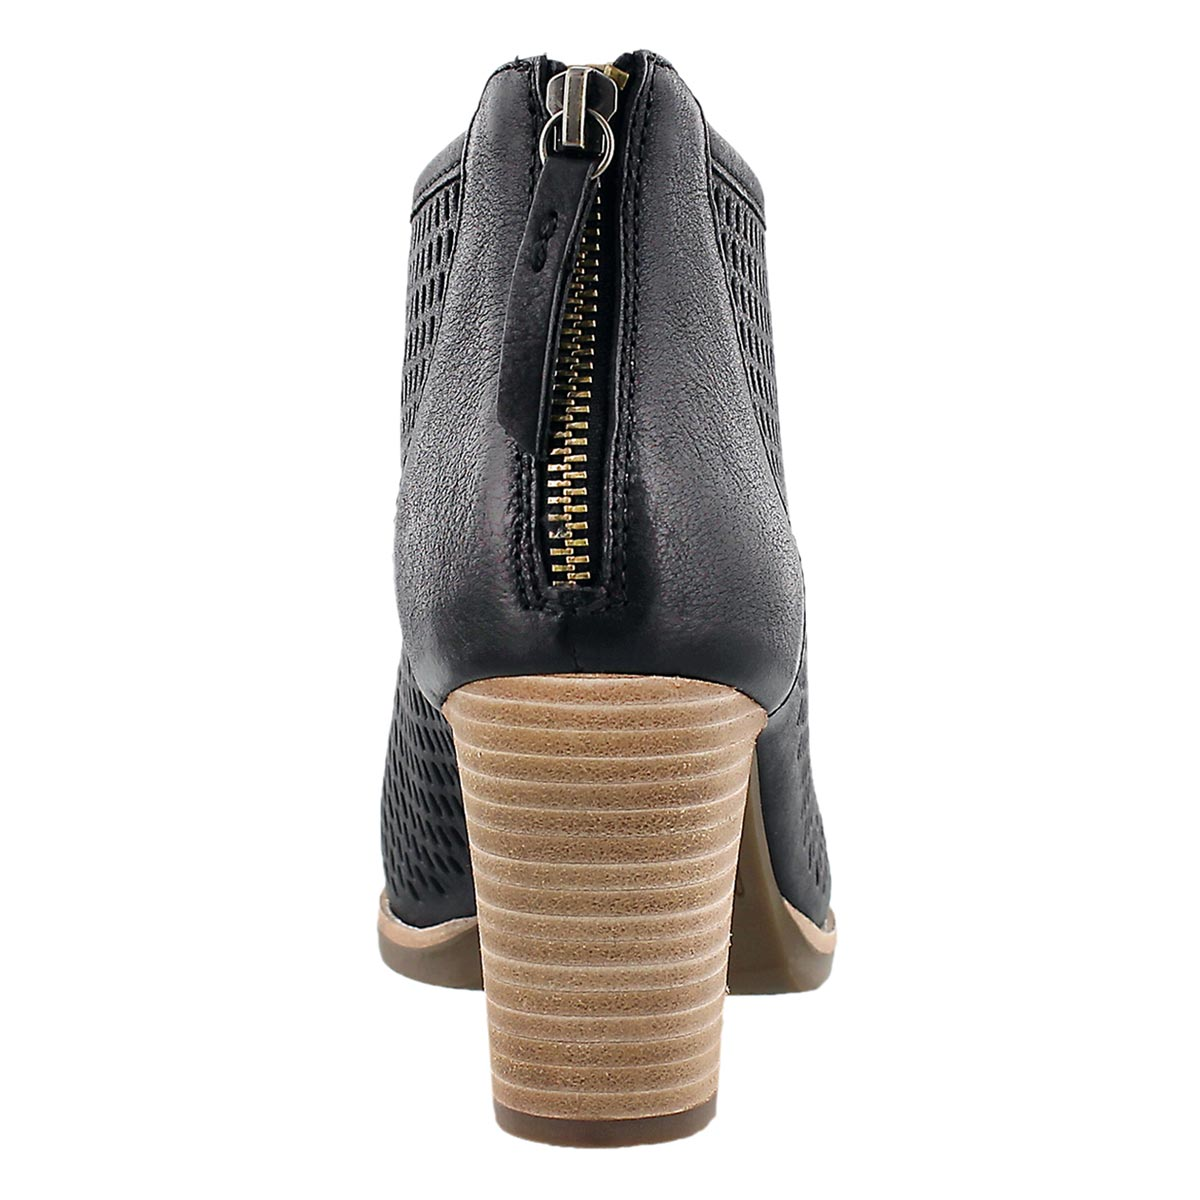 Lds New Callie black perf peep toe heel